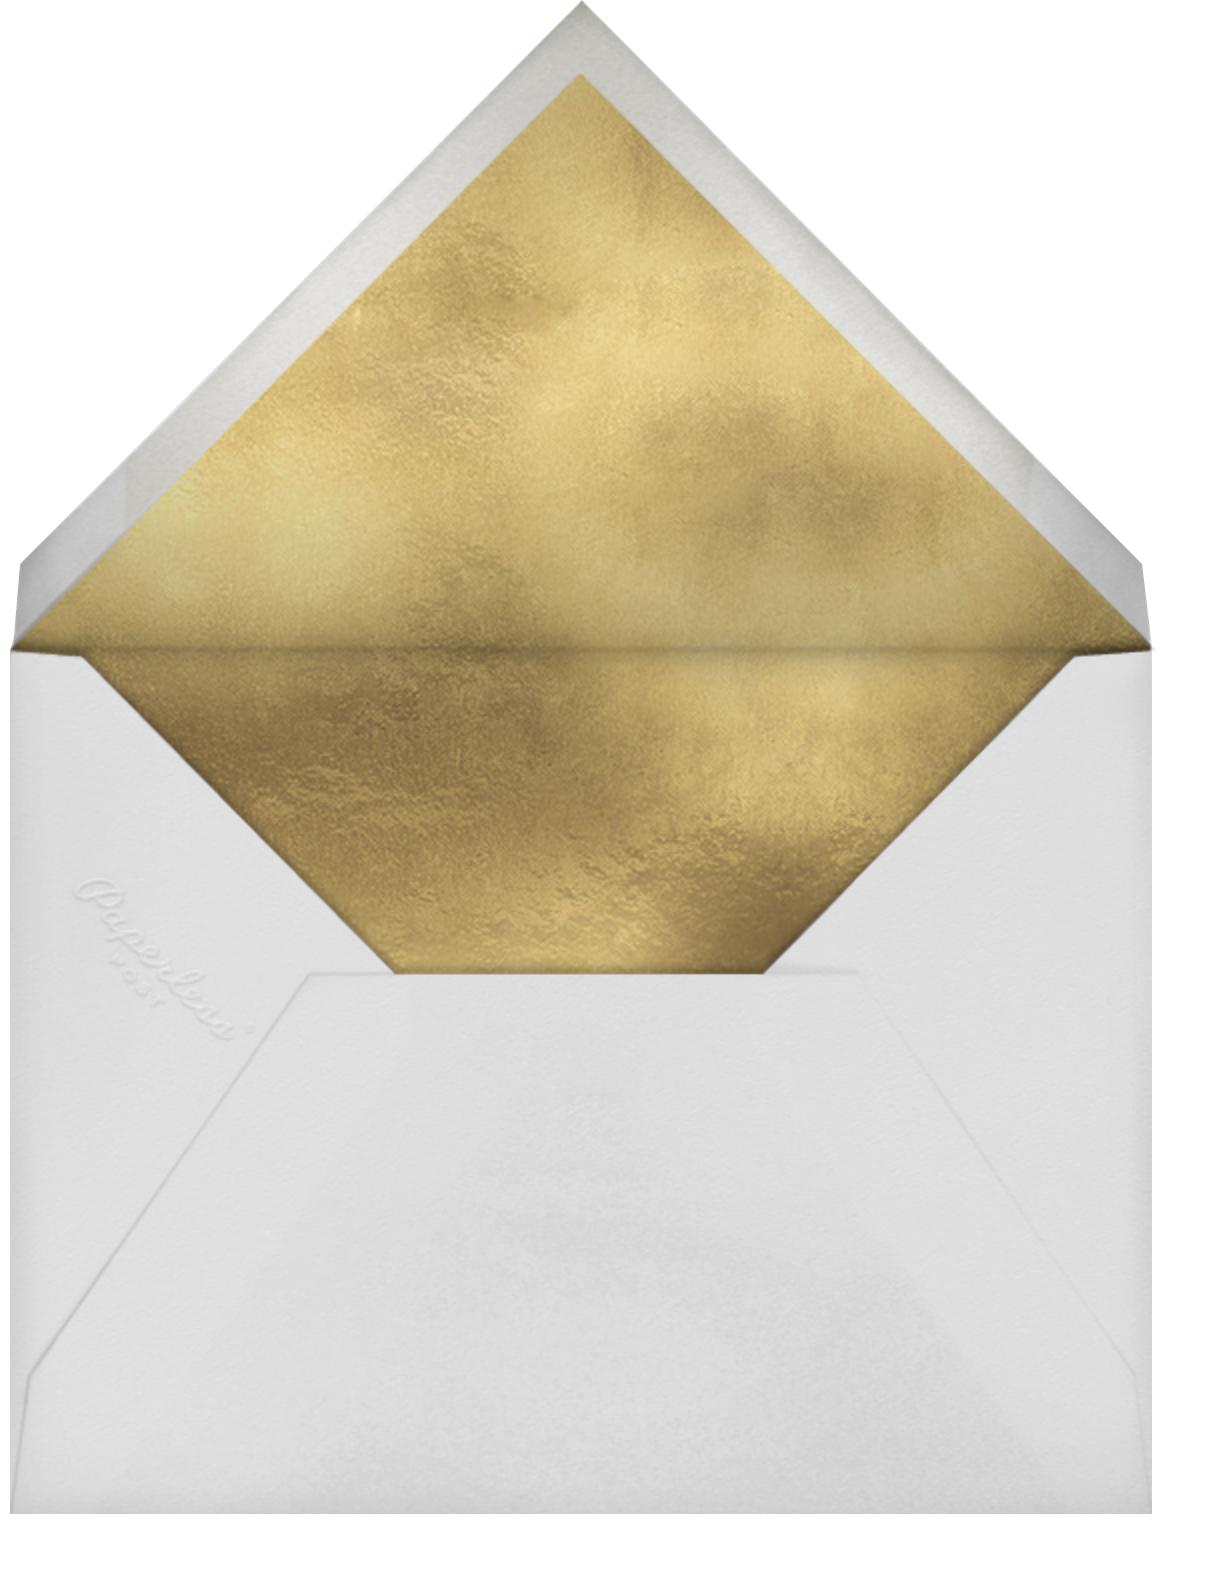 Stars Aligned - Sugar Paper - Graduation party - envelope back